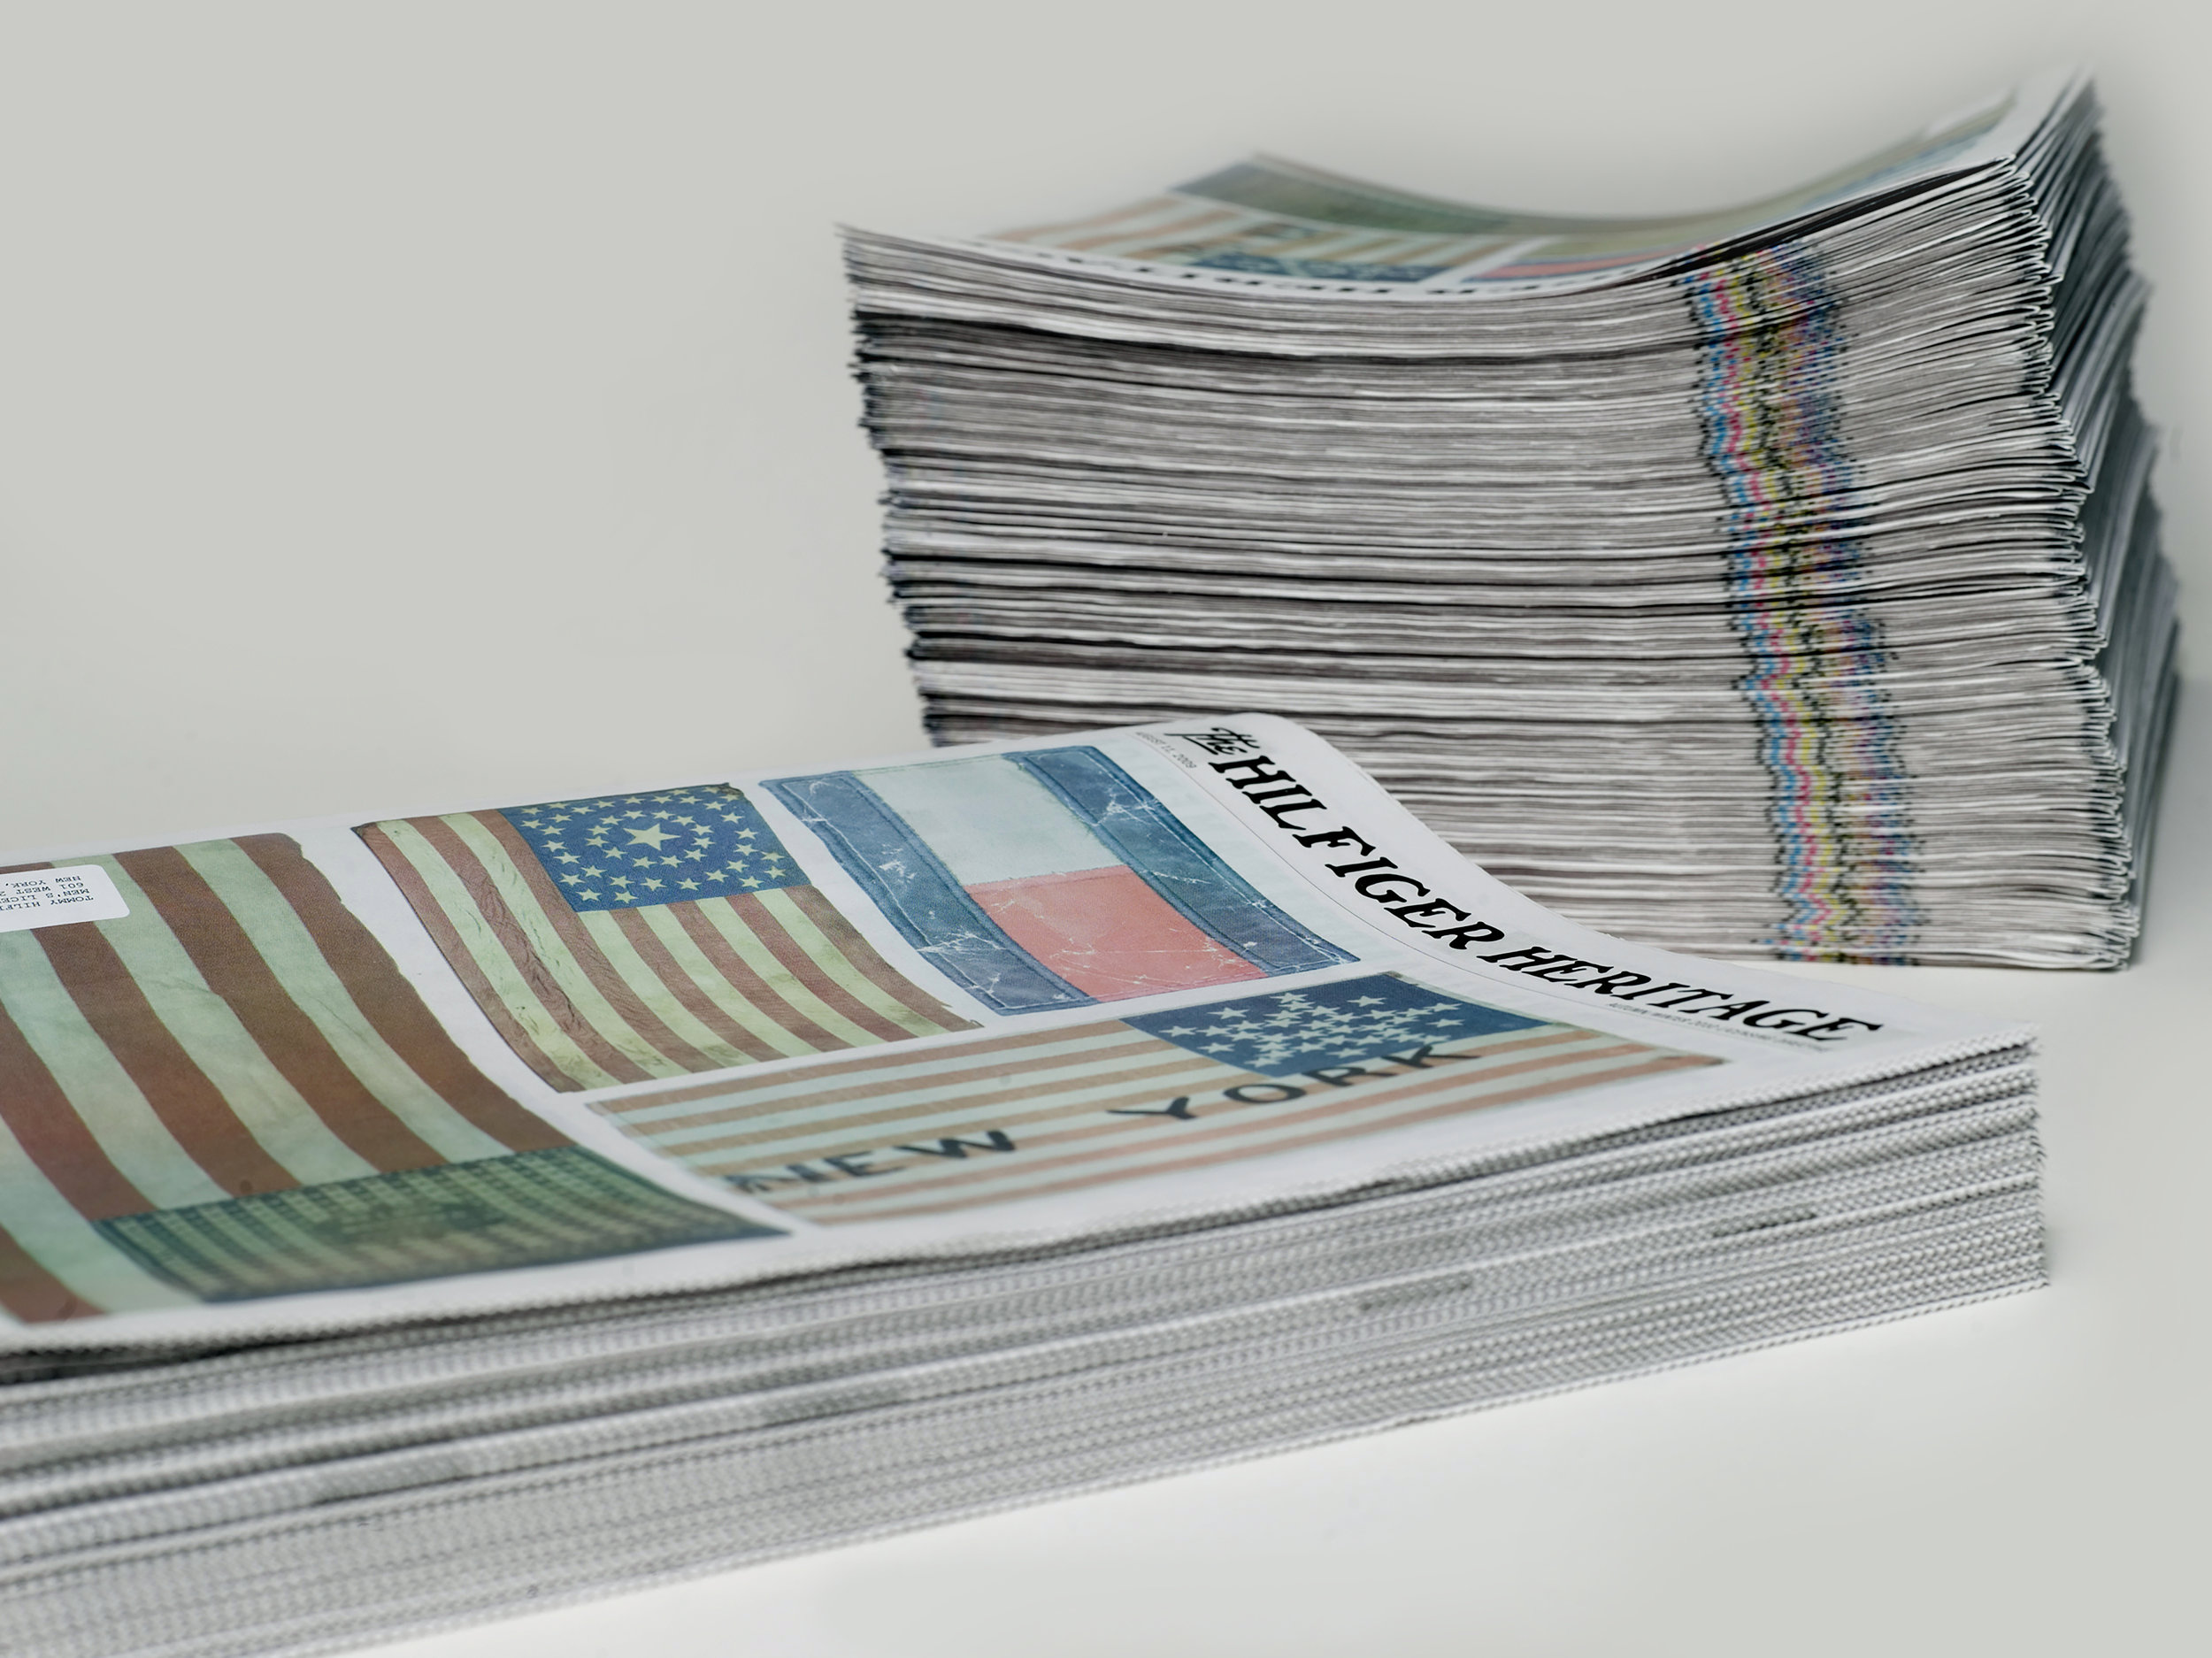 Newspapers_007A.jpg